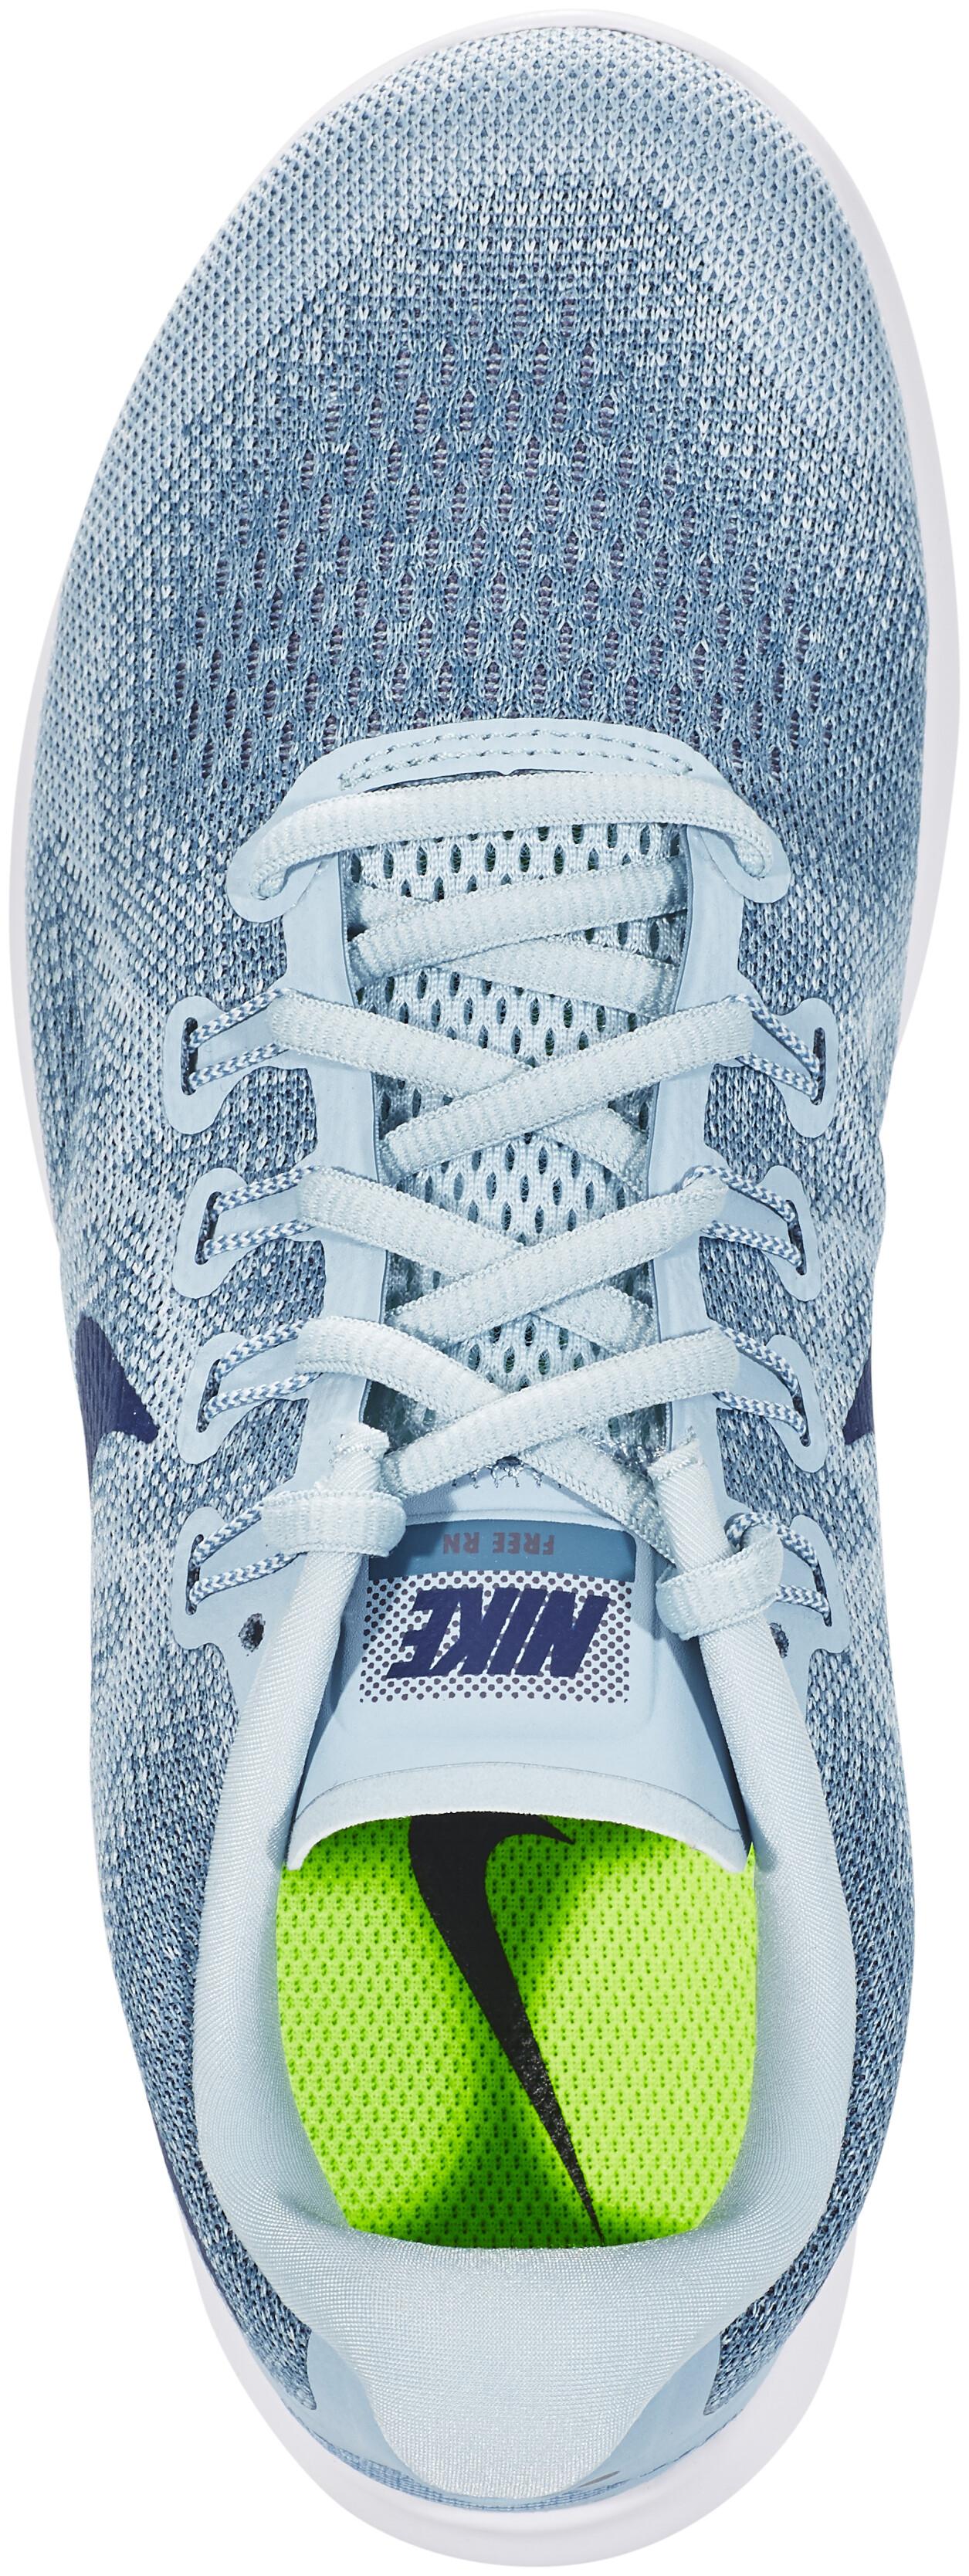 nike free rn 2017 running shoes women blue at addnaturecouk